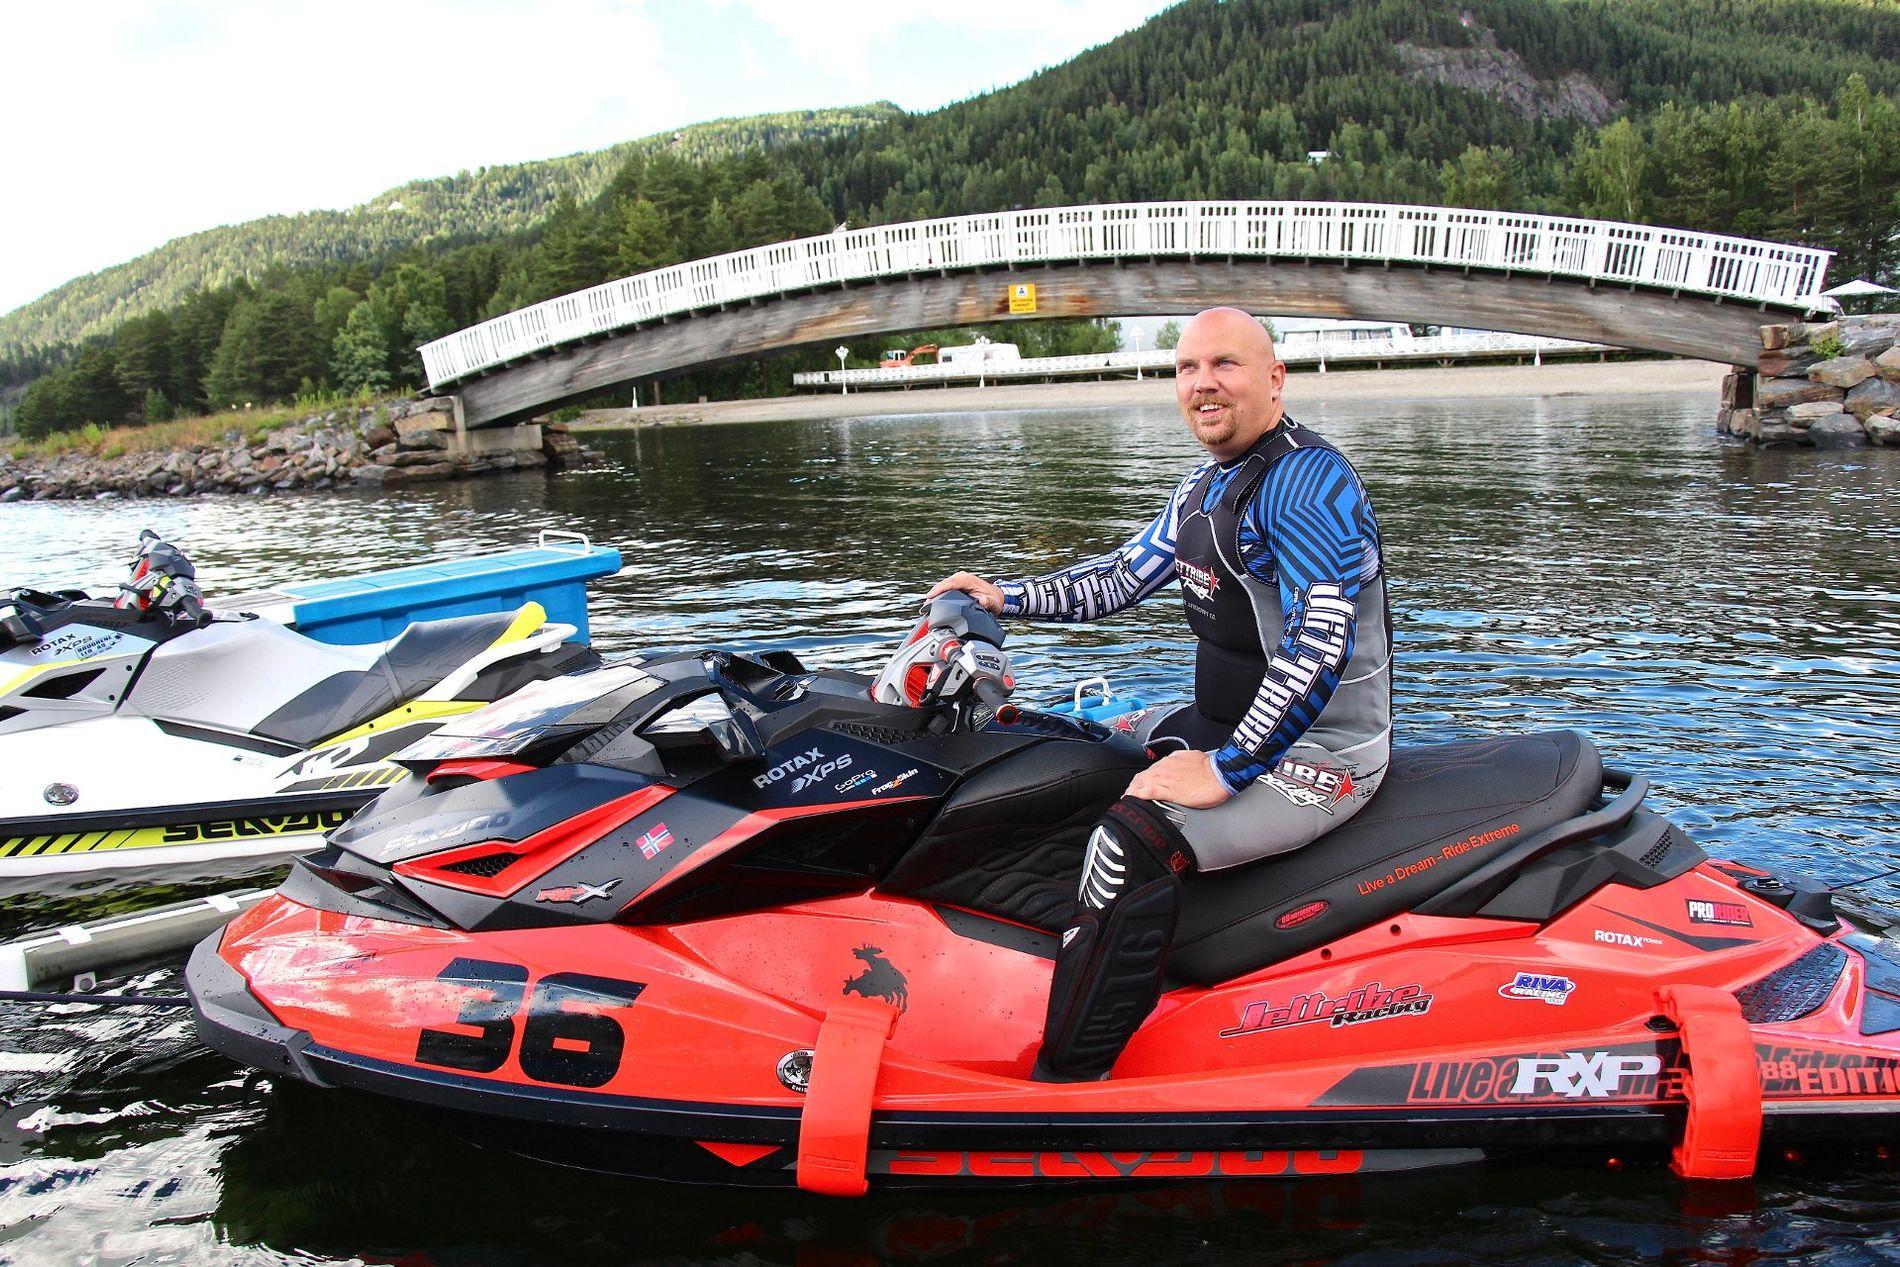 POSITIV TIL NYE REGLER: Lederen i Vannscooter Norge Christian Hammernes er ikke negativ til førerkort for vannscooterførere, men mener kravet bør likstilles for andre hurtiggeånde fartøyer på sjøen.